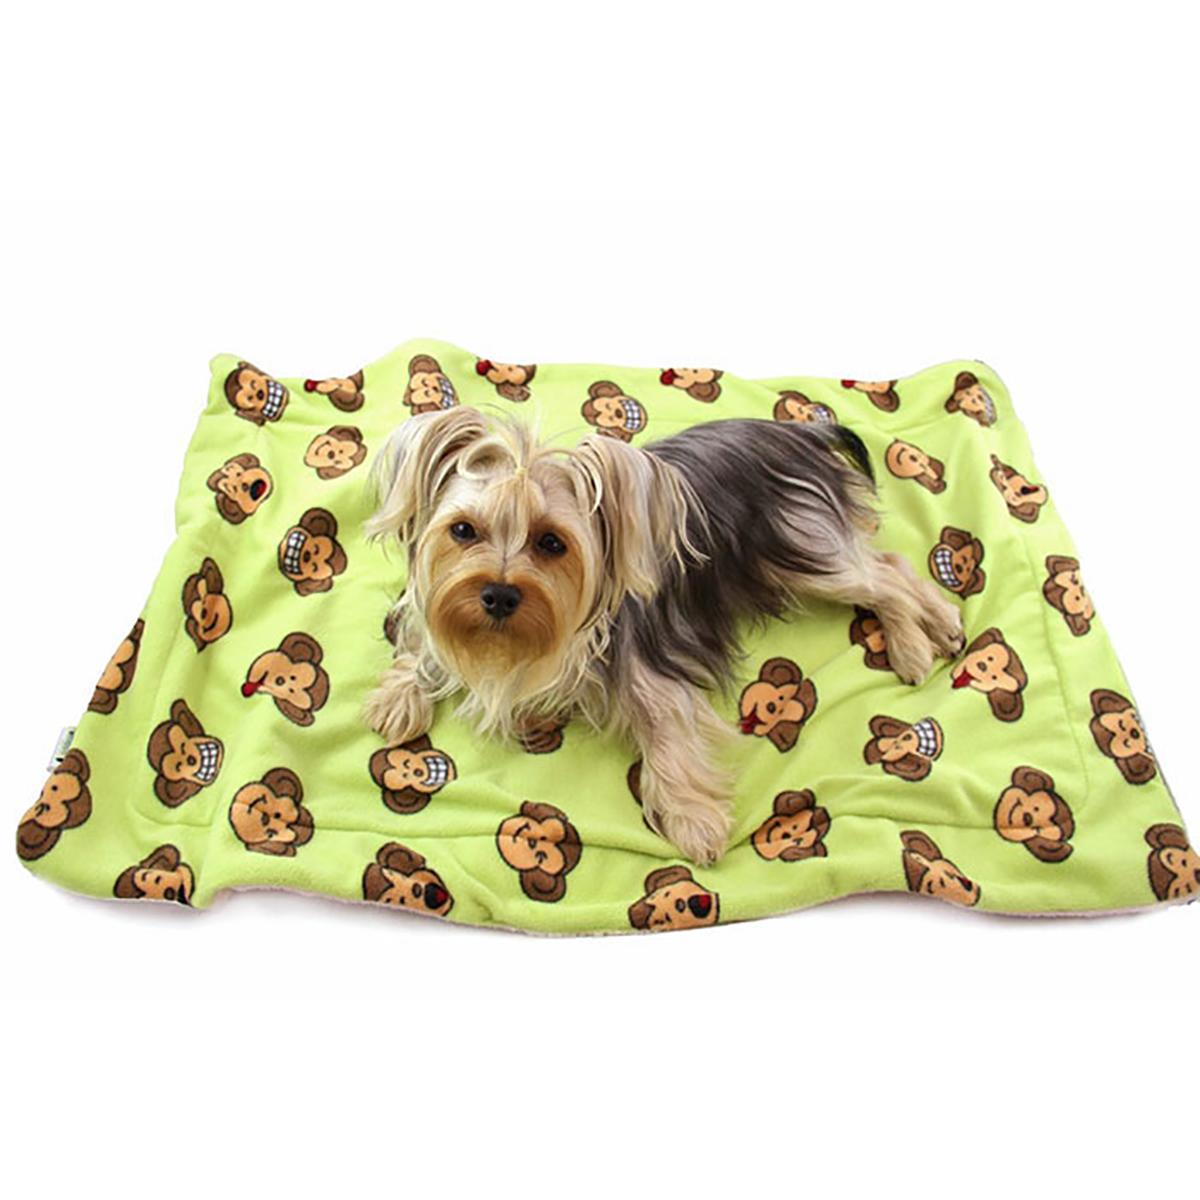 Silly Monkey Ultra-Plush Dog Blanket by Klippo - Lime